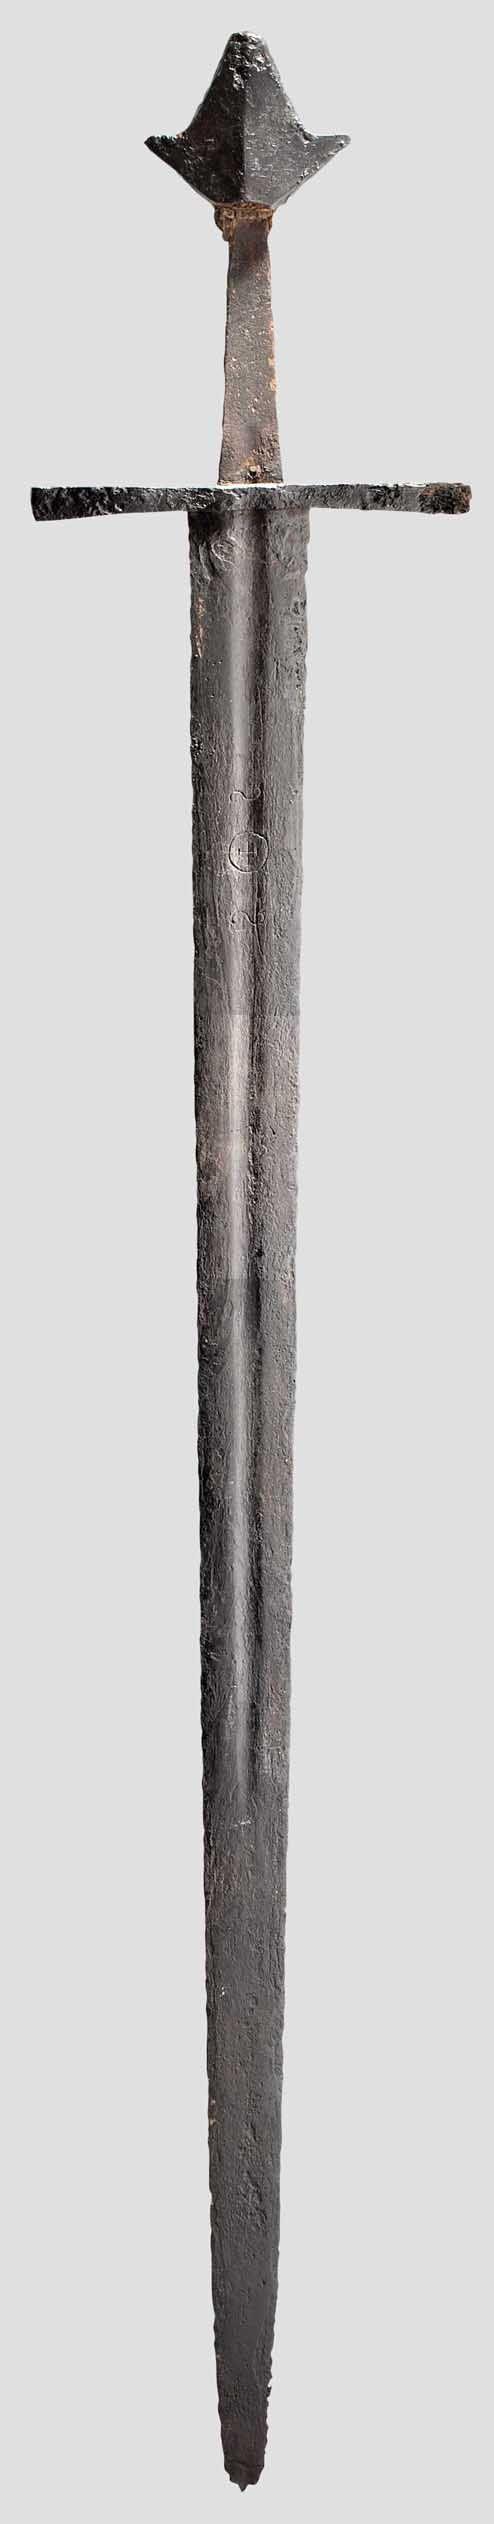 A very particular 13th century European arming sword.                                                                                                                                                                                 More